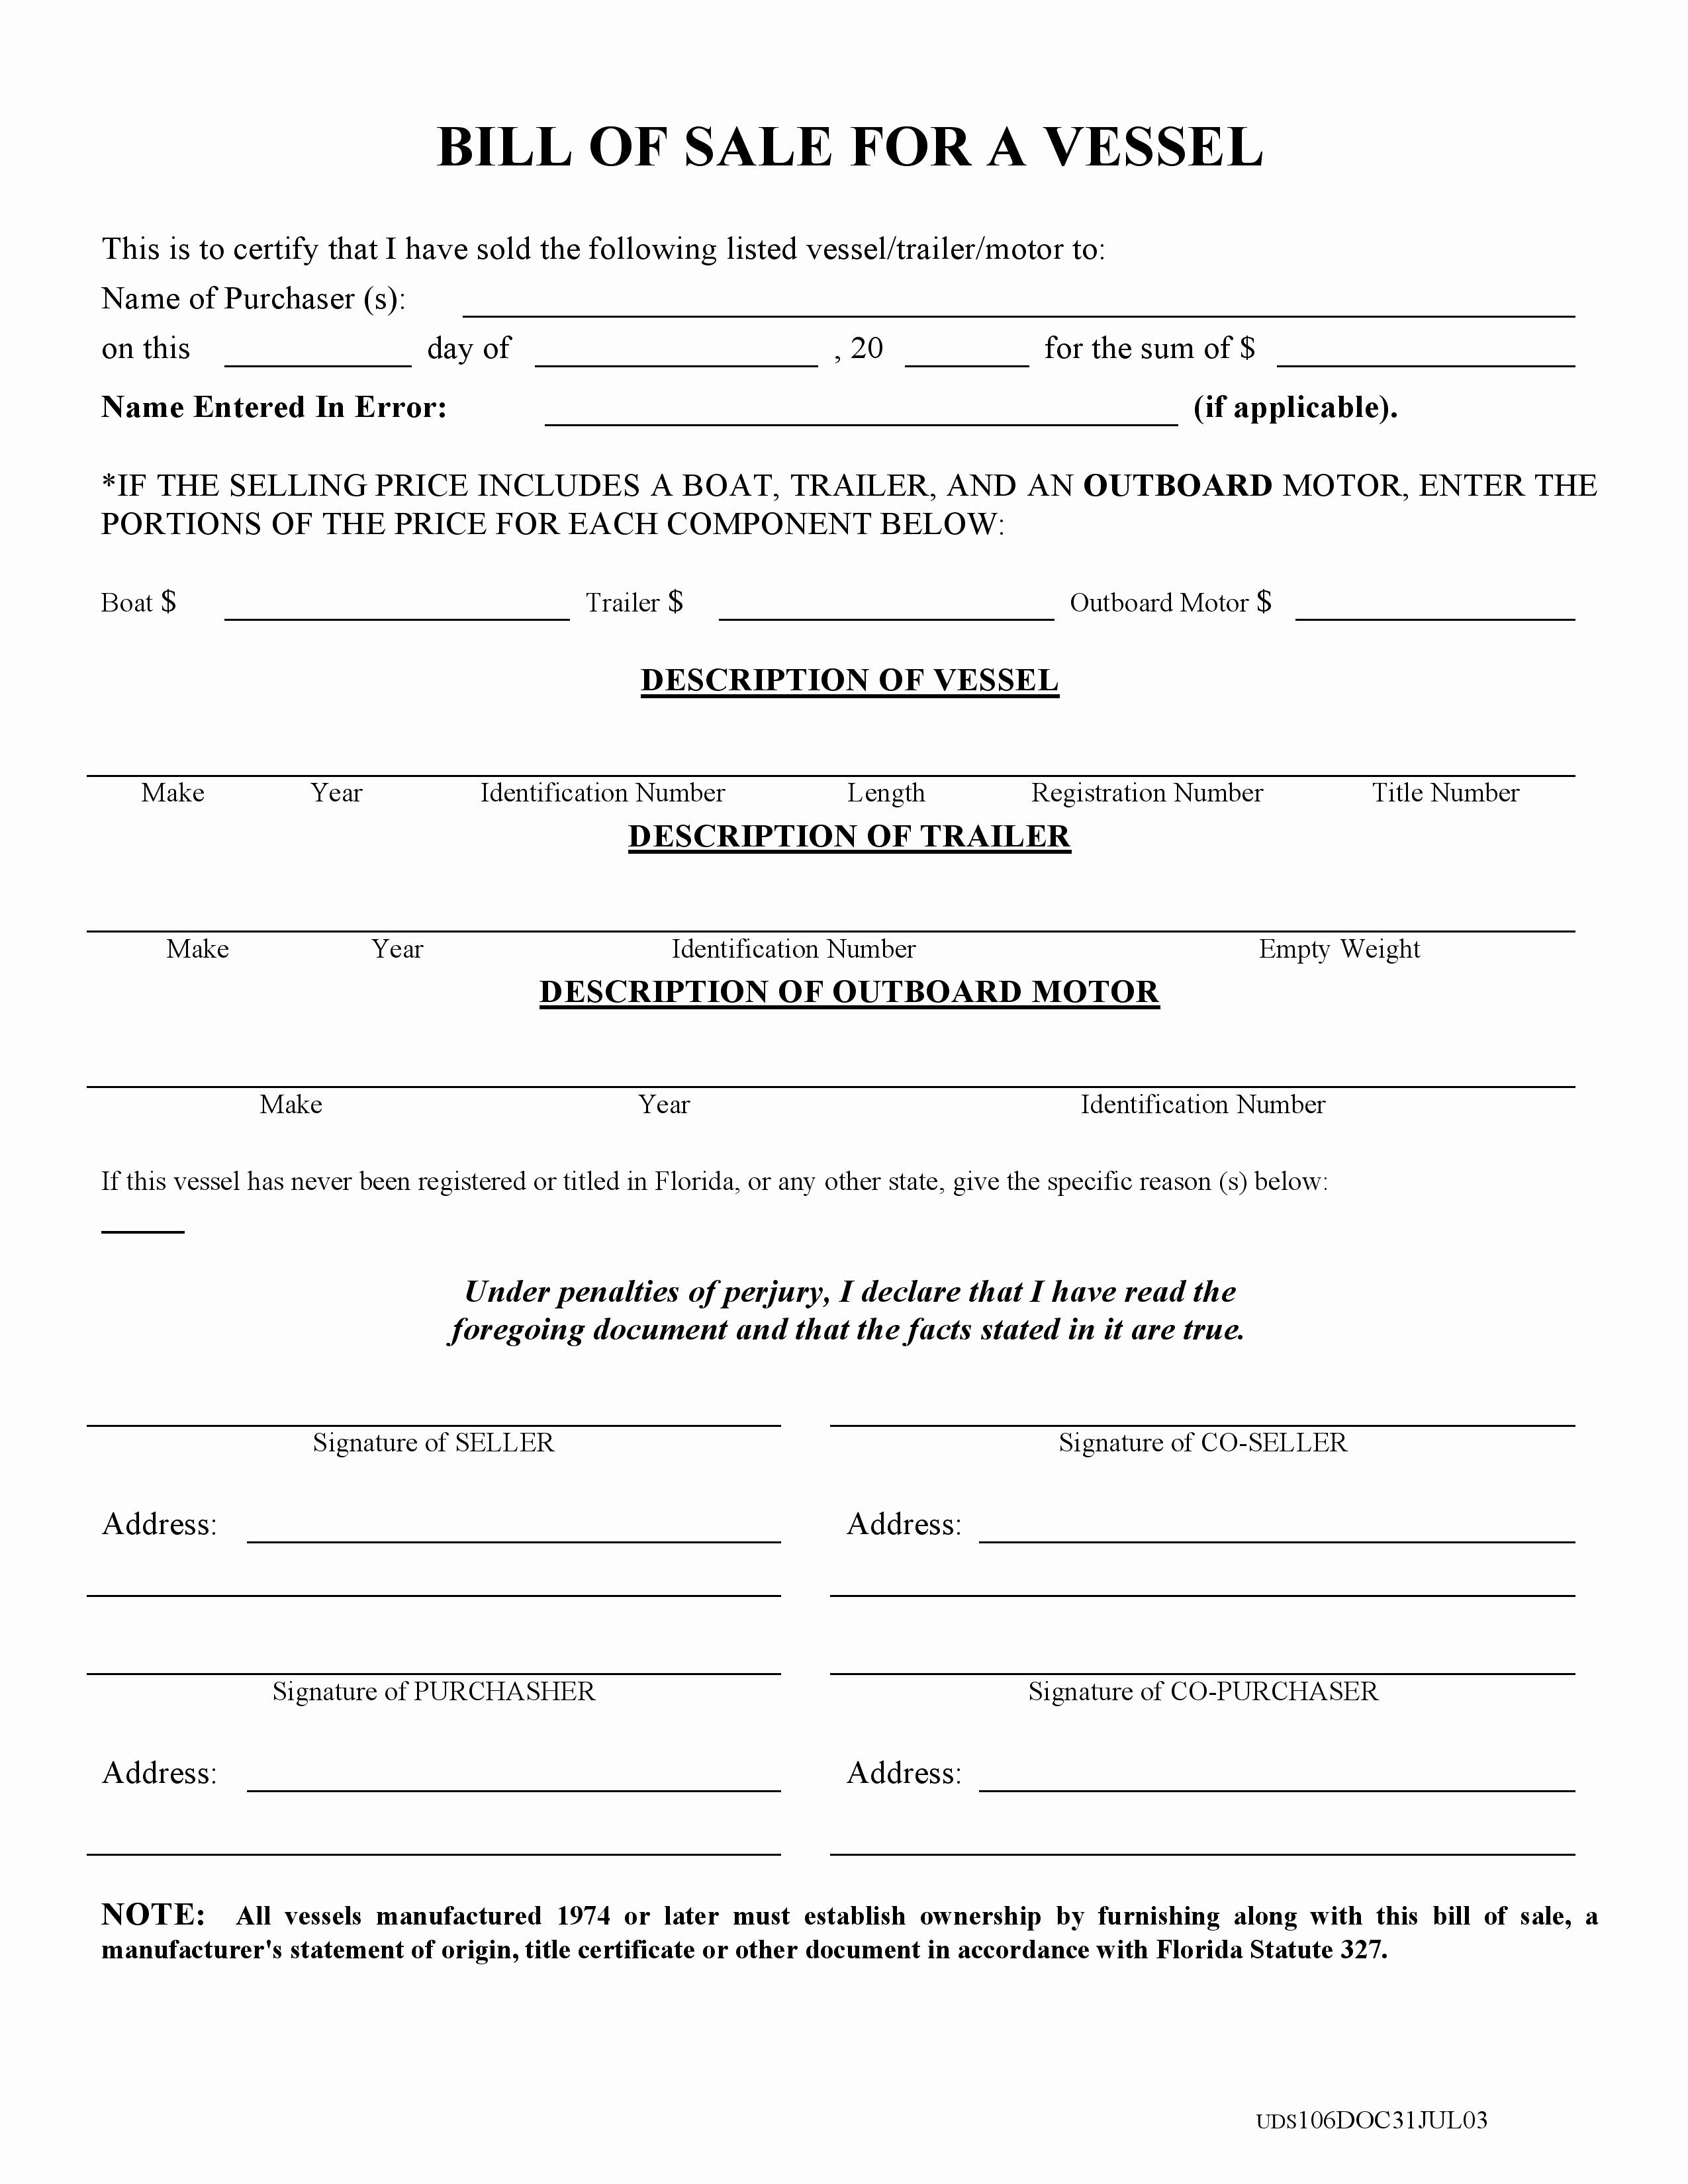 Florida Firearm Bill Of Sale Luxury Free Florida Boat Bill Of Sale form Pdf